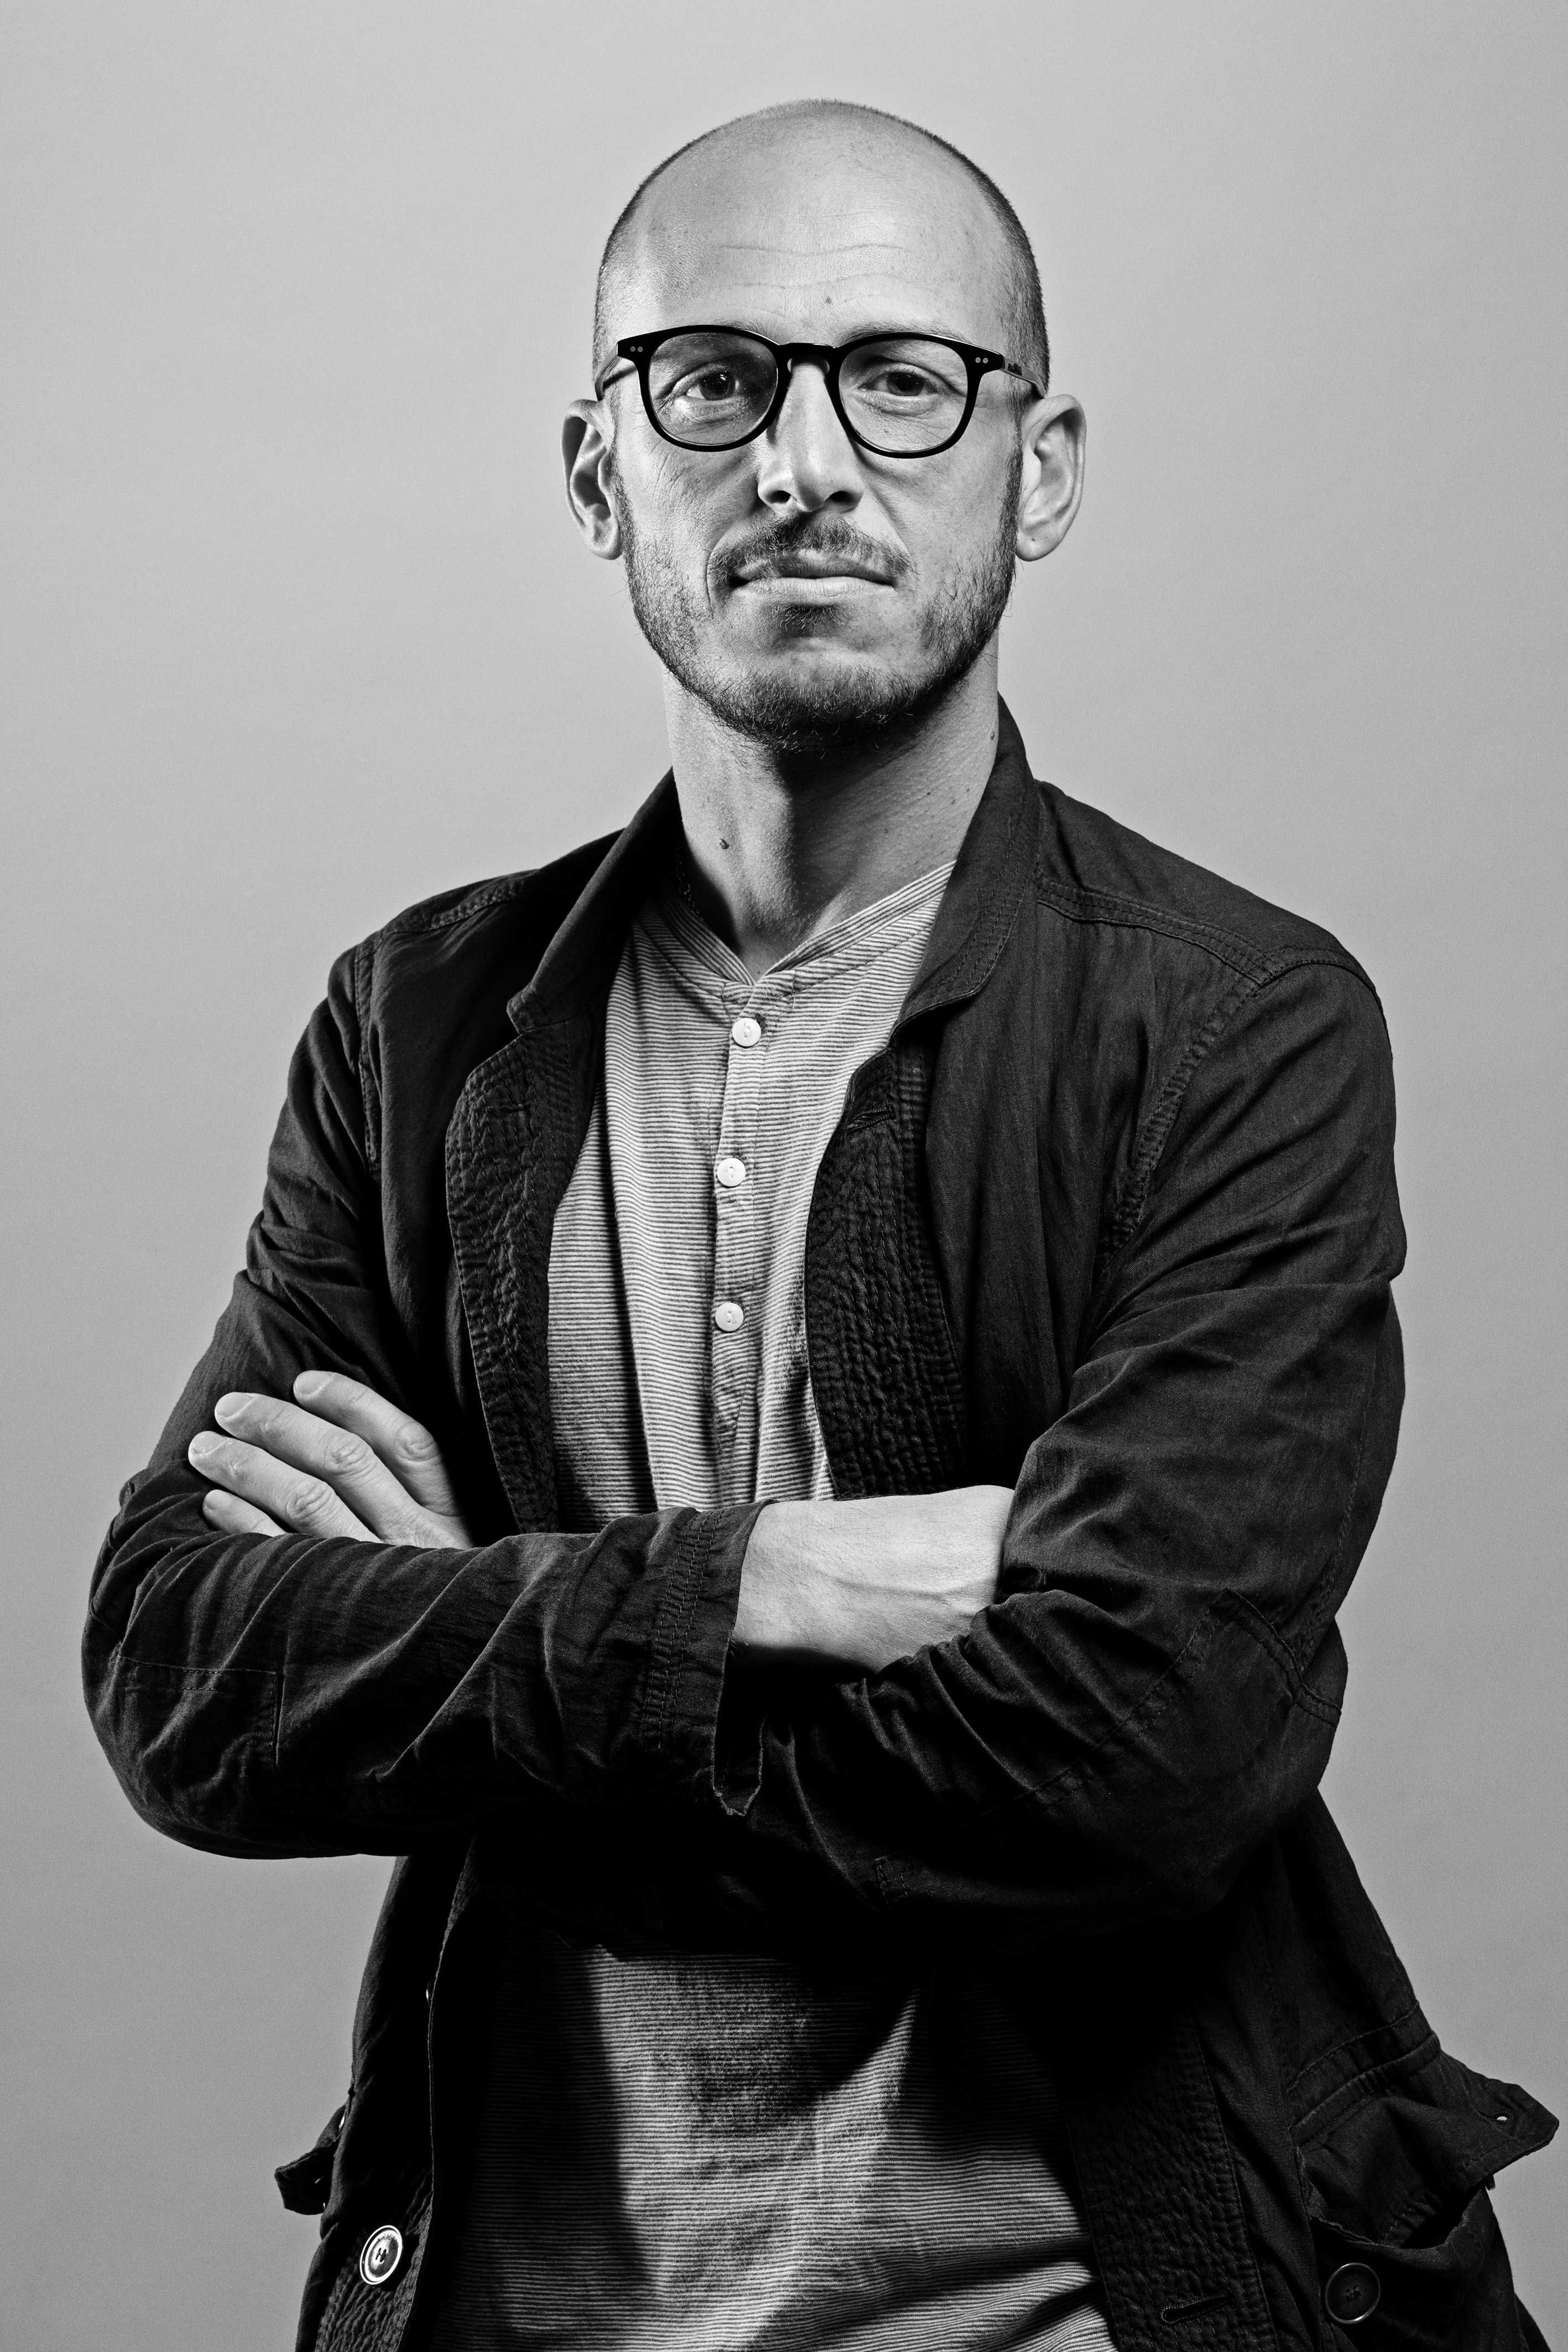 Monteleone @LorenzoPoli